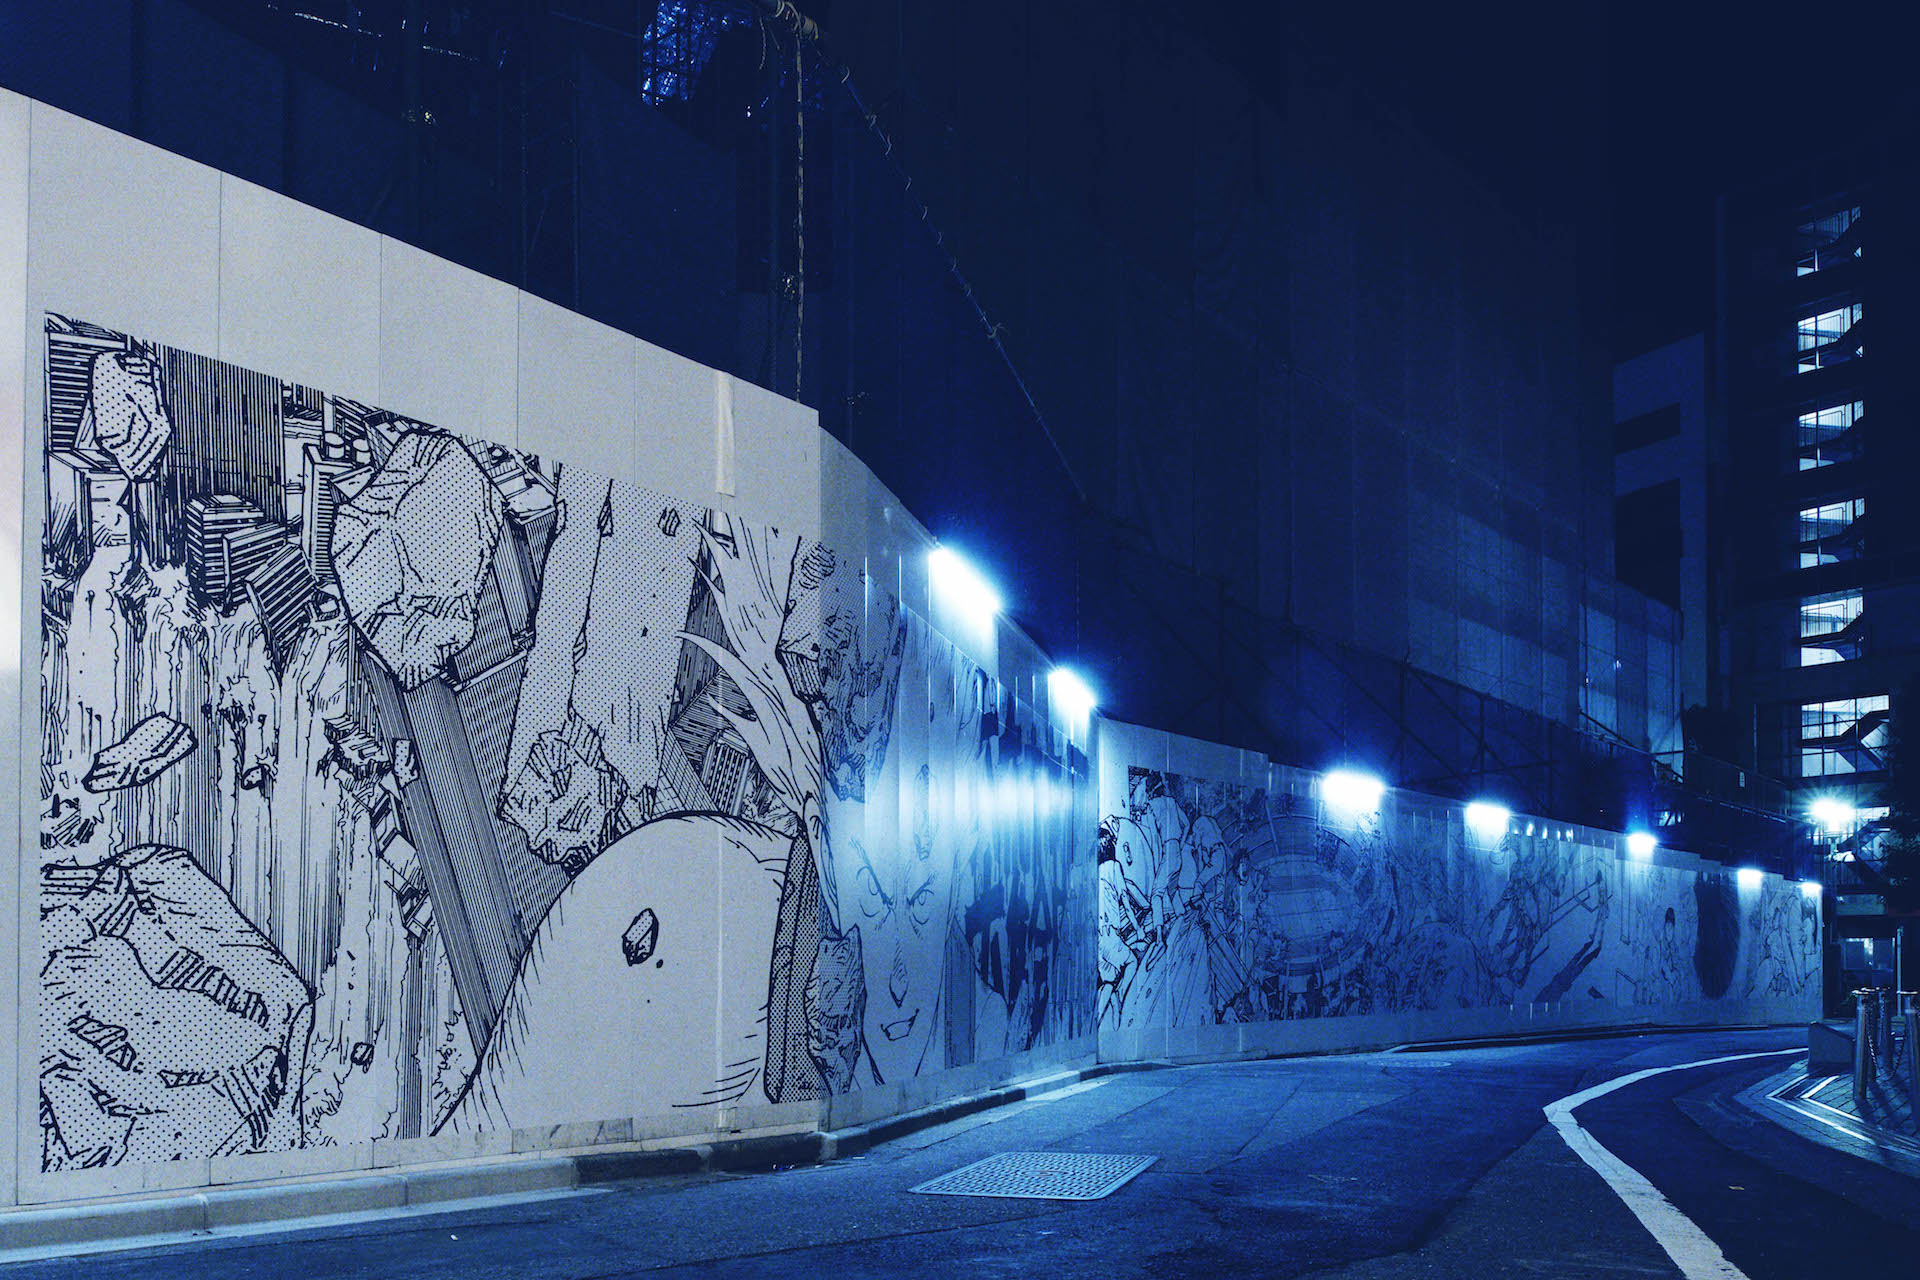 <AKIRA ART OF WALL>、PARCO MUSEUM TOKYO&GALLERY Xオープン記念エキシビジョンとして開催決定 art190919_akira_artofwall_2